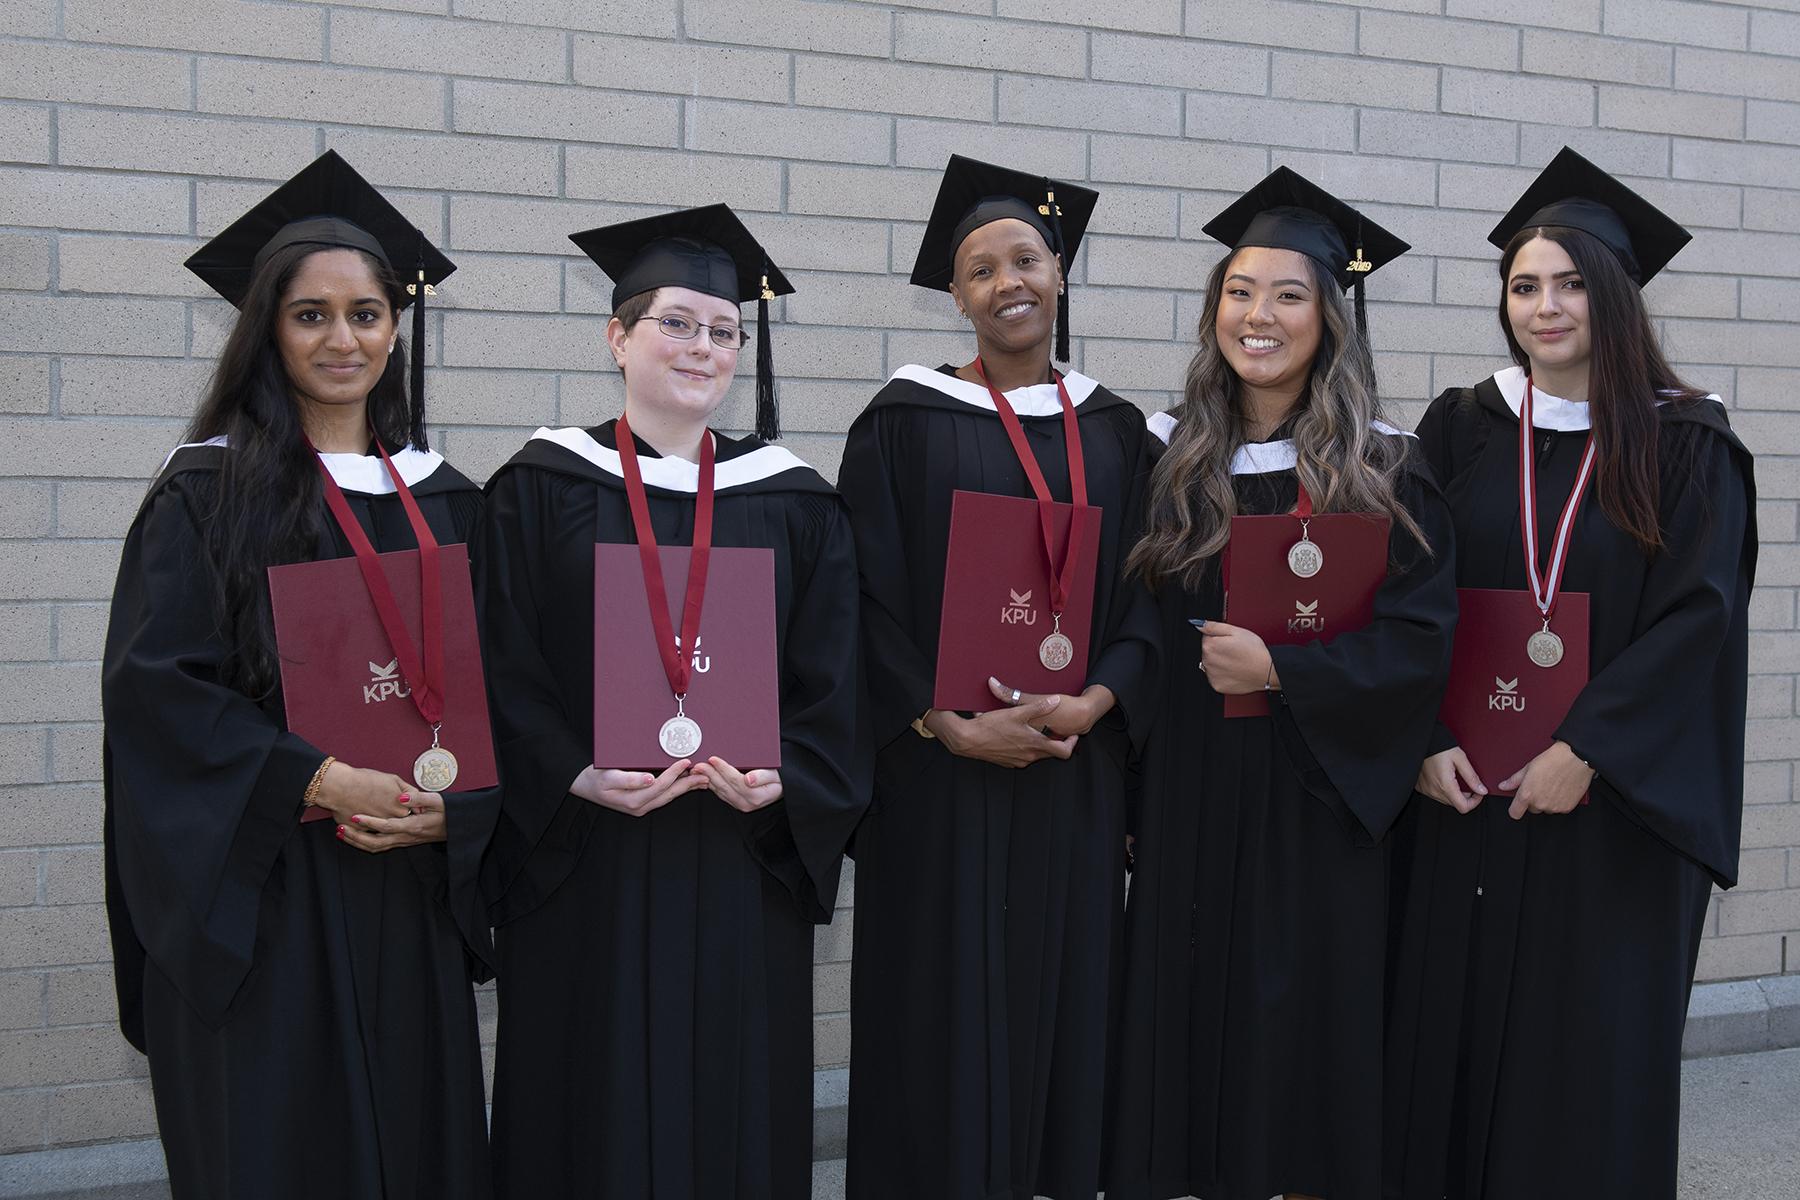 KPU English Graduates 2019